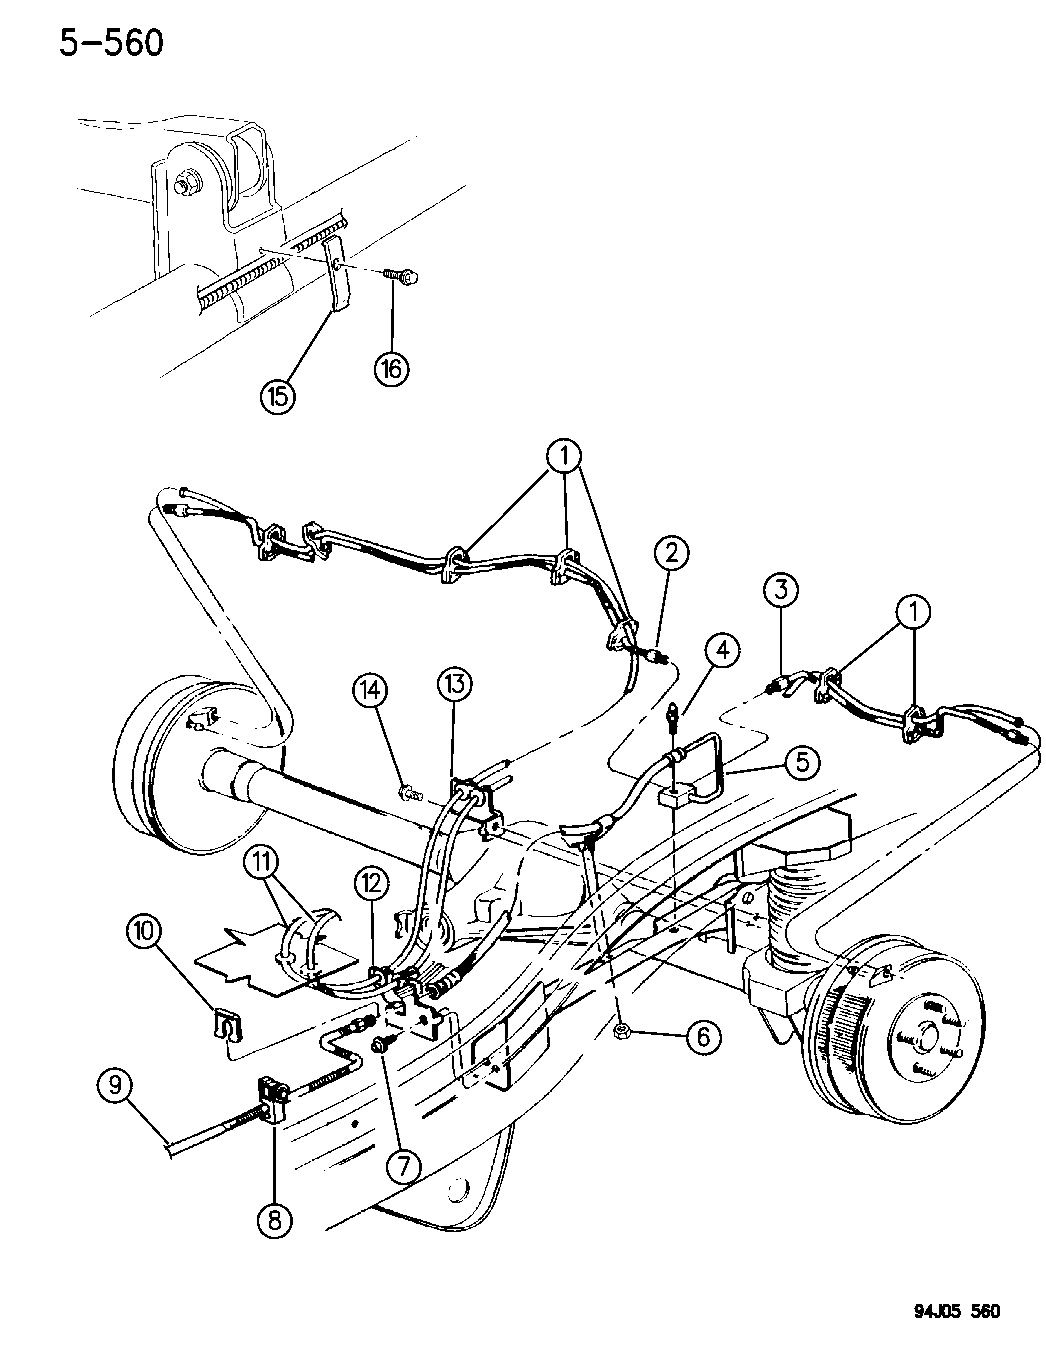 1996 Jeep Grand Cherokee Brake Lines & Hoses (Rear)